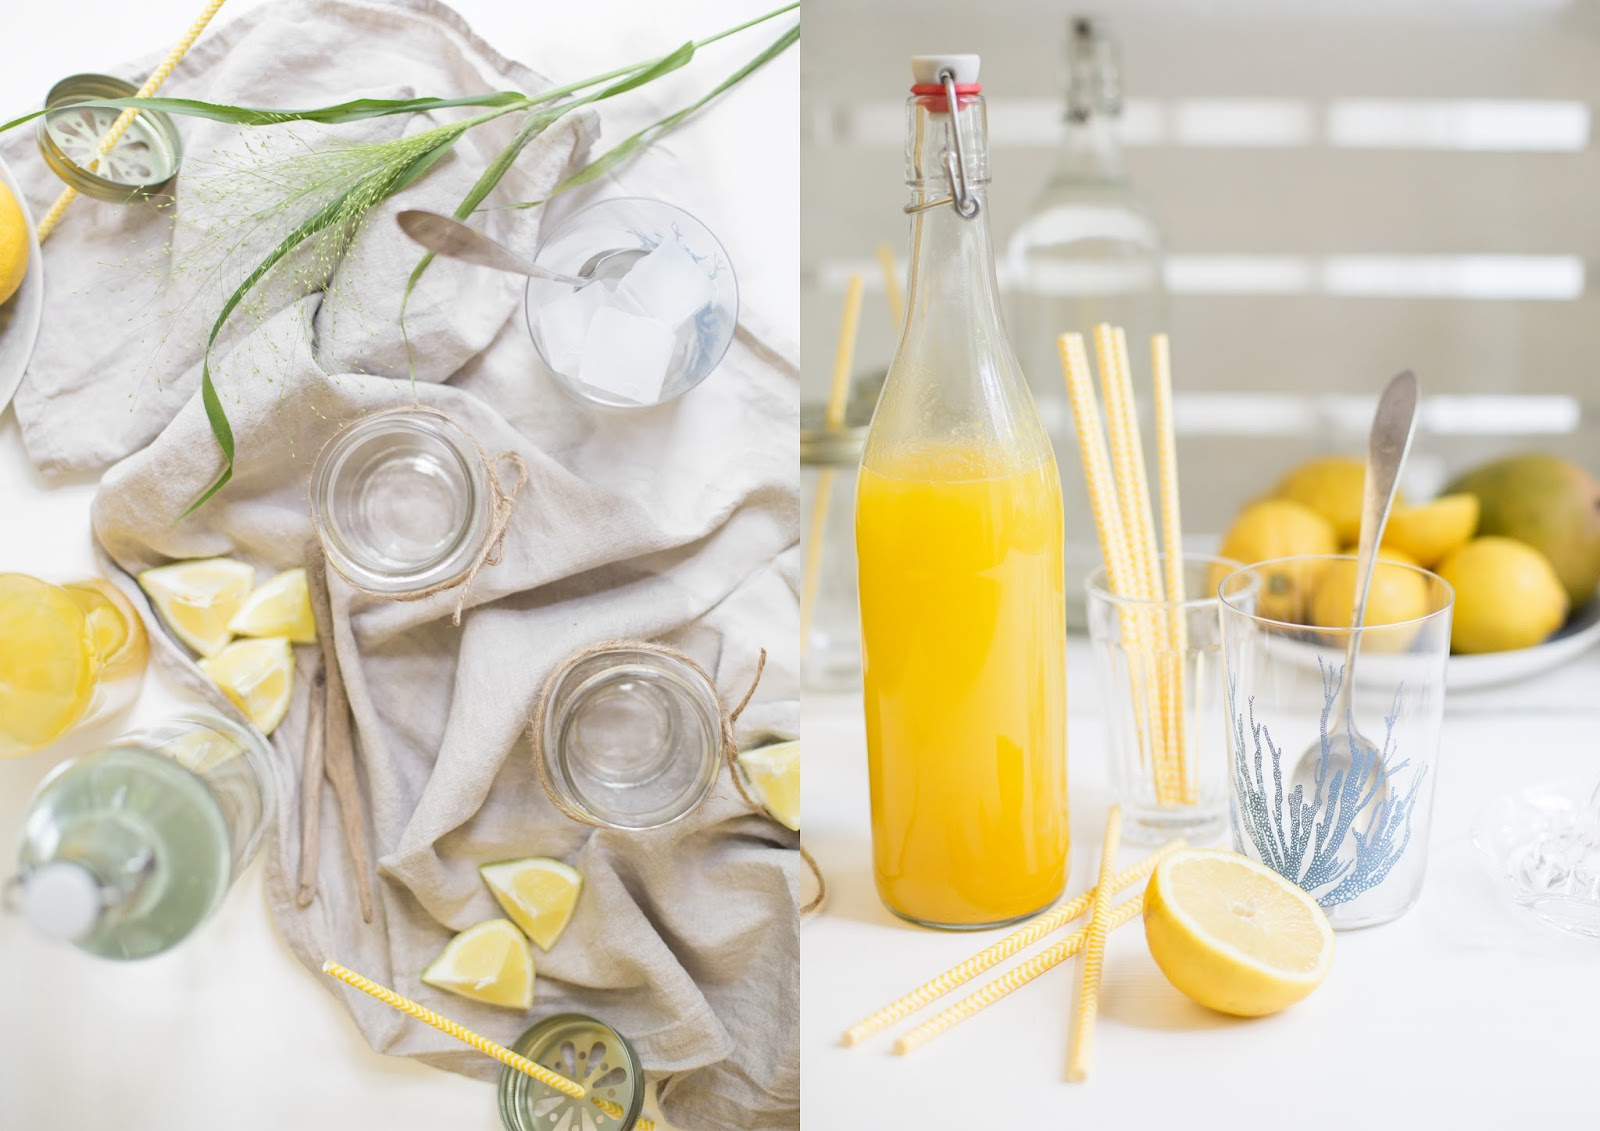 Homemade Mango-Zitronen-Limonade